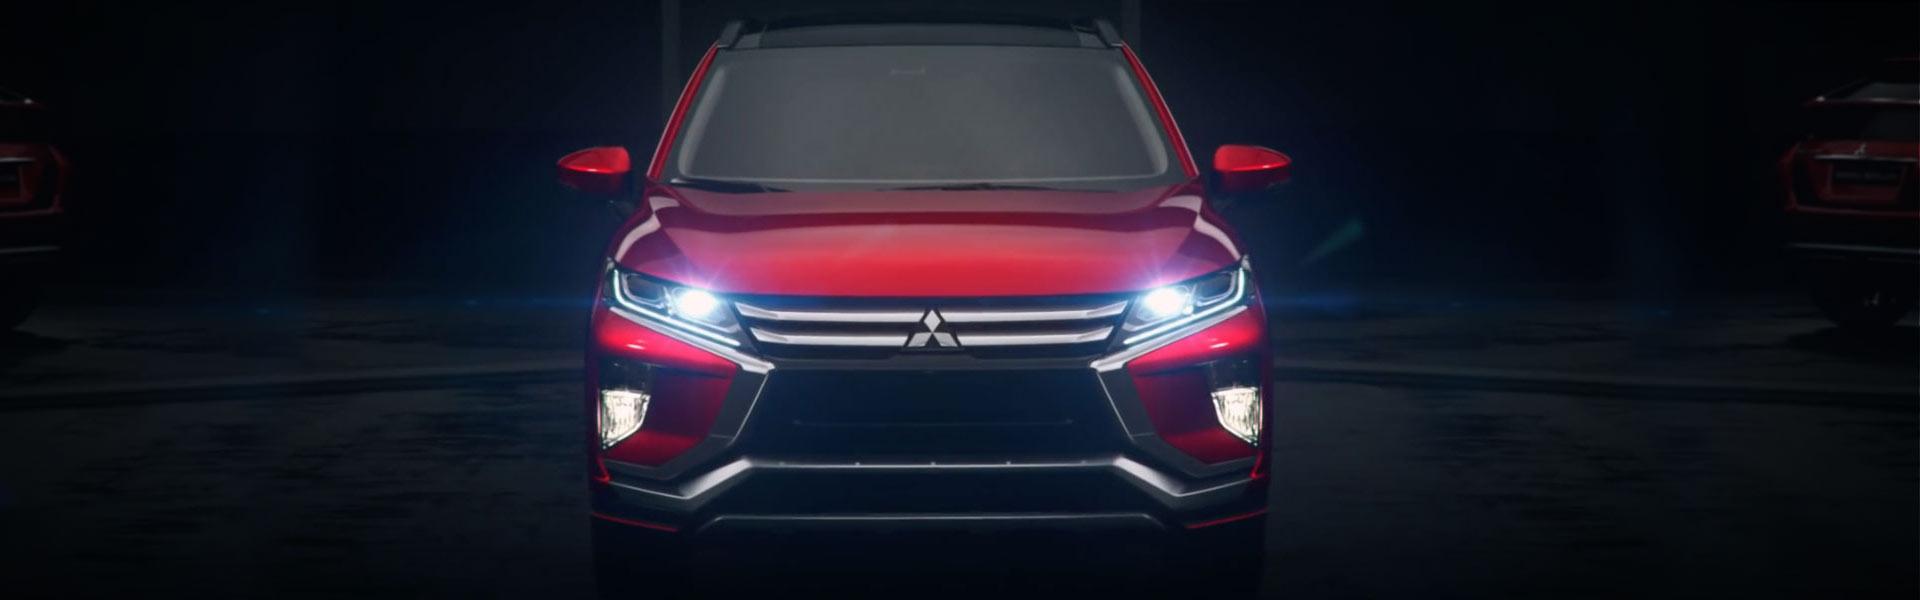 LED-headlights-on-2018-Mitsubishi-Eclipse-Cross-d.jpg